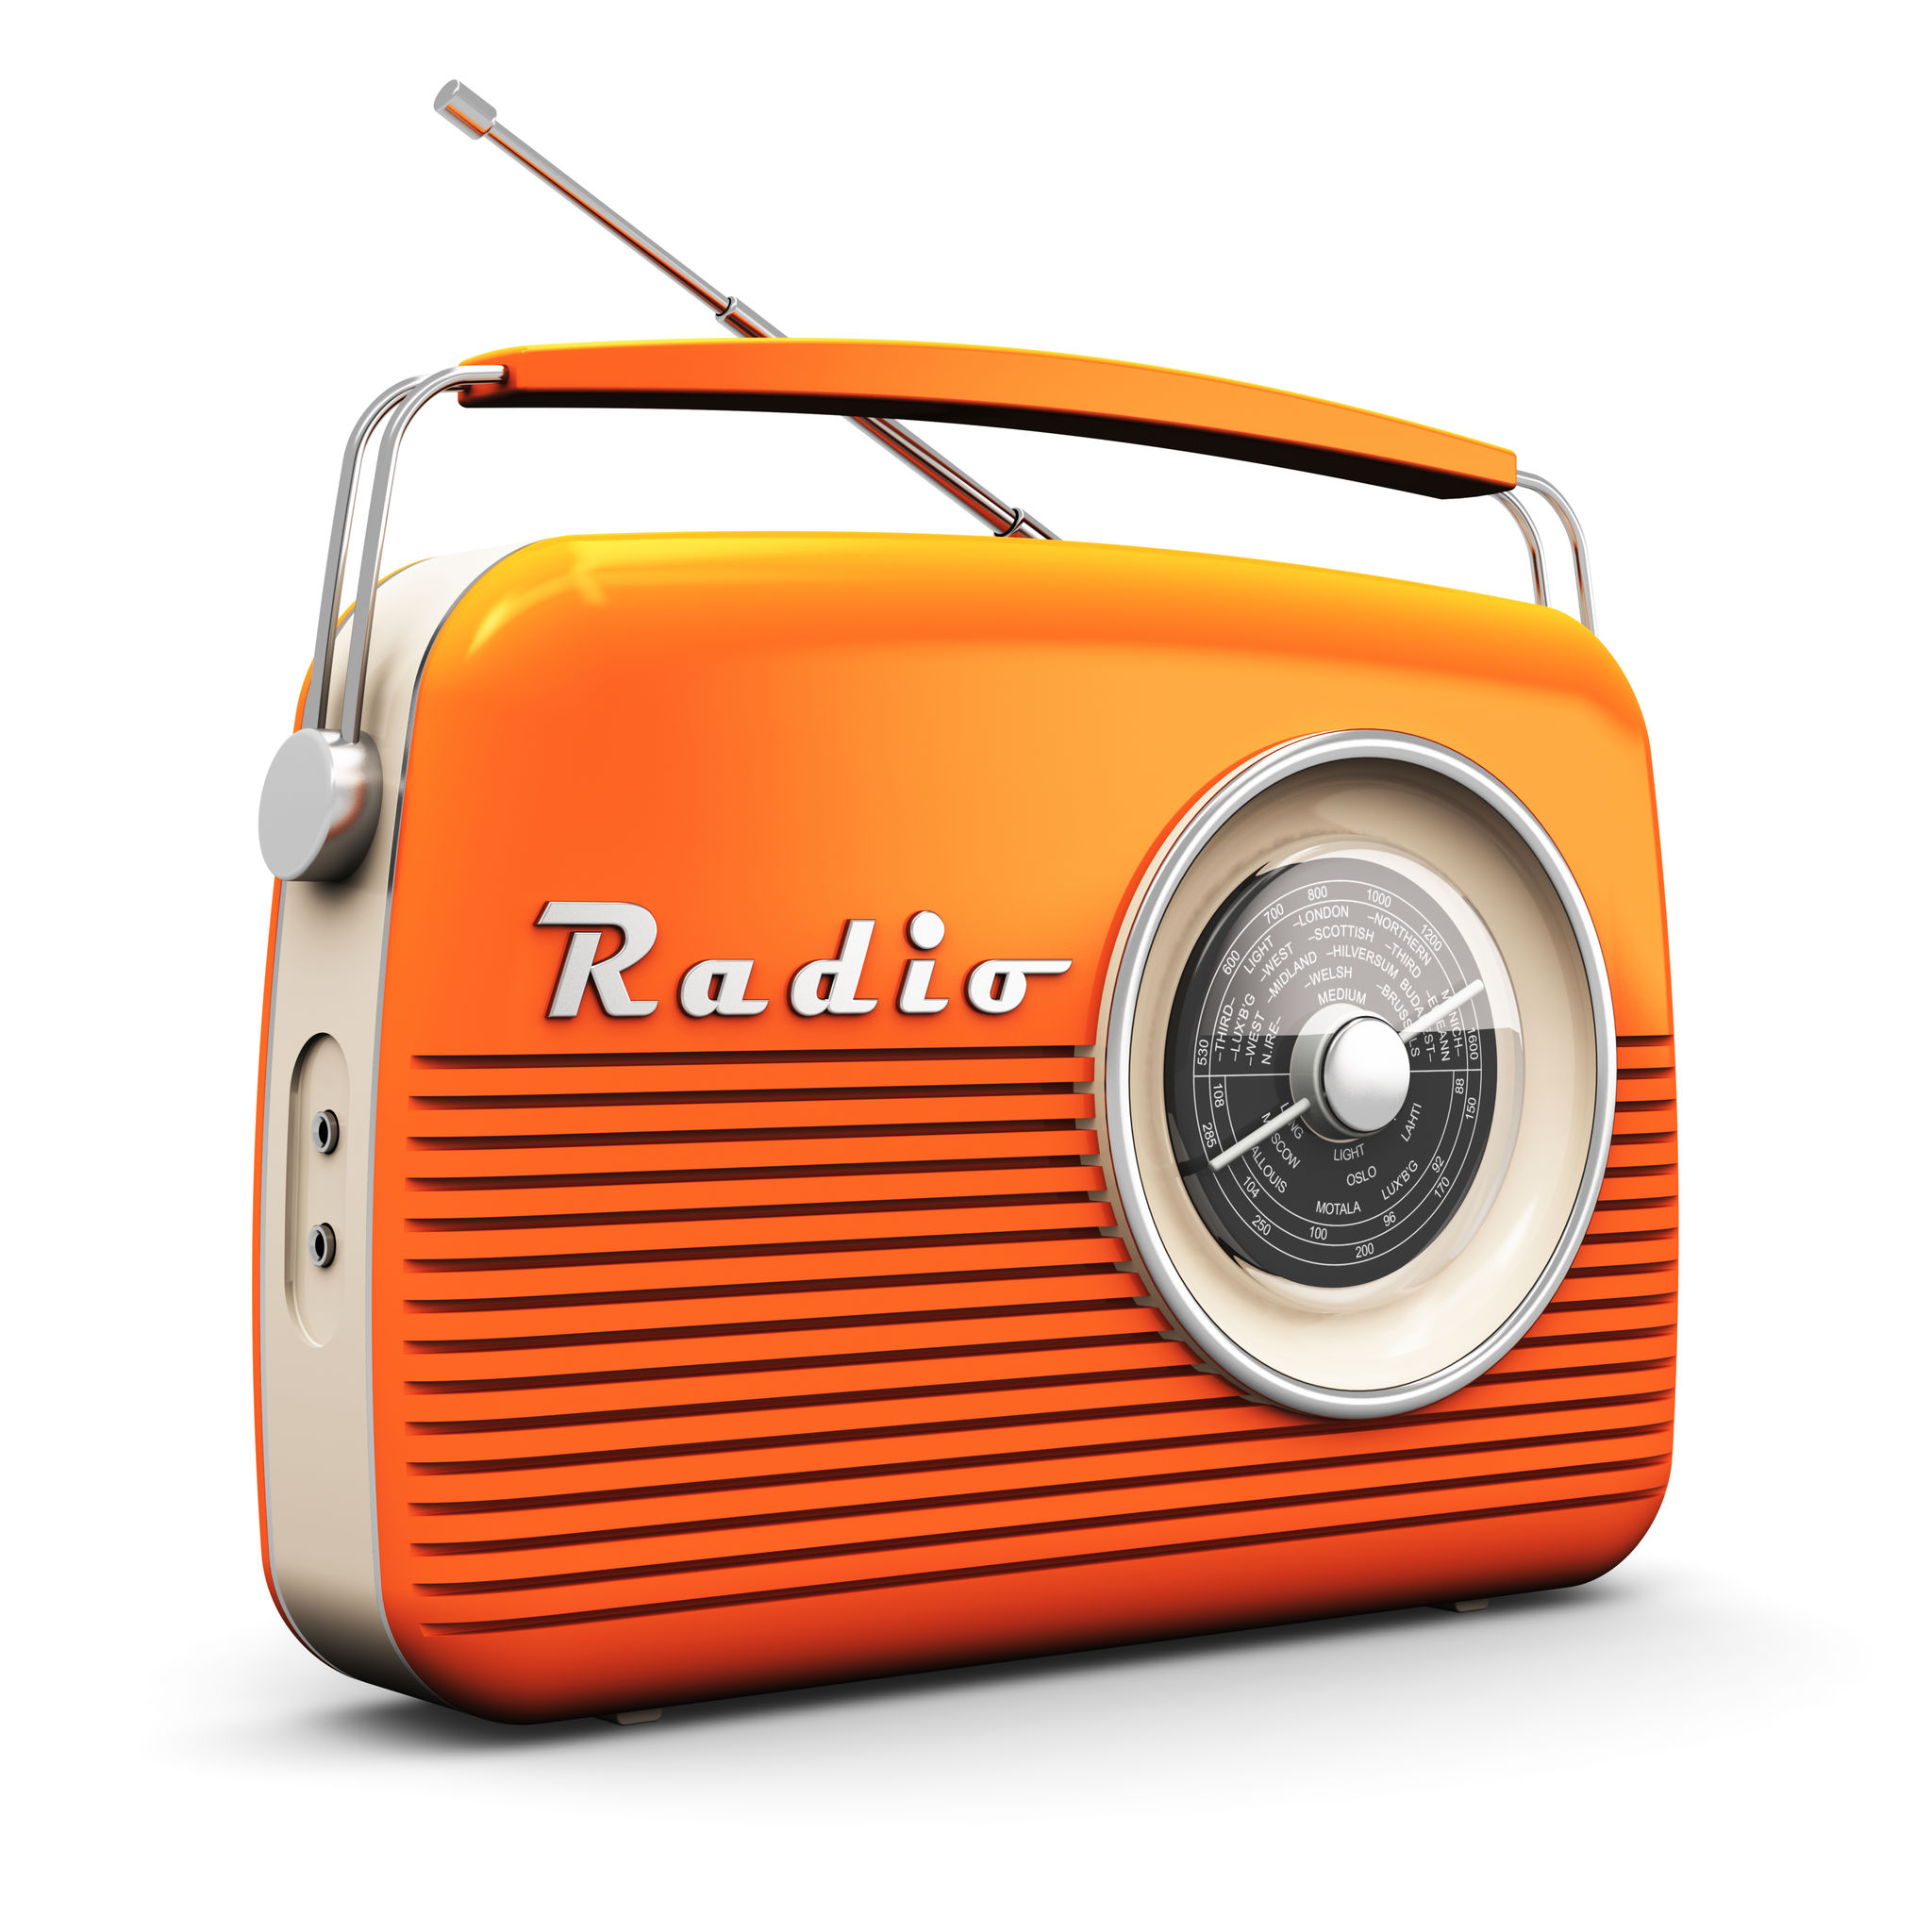 51752648 - old orange vintage retro style radio receiver isolated on white background